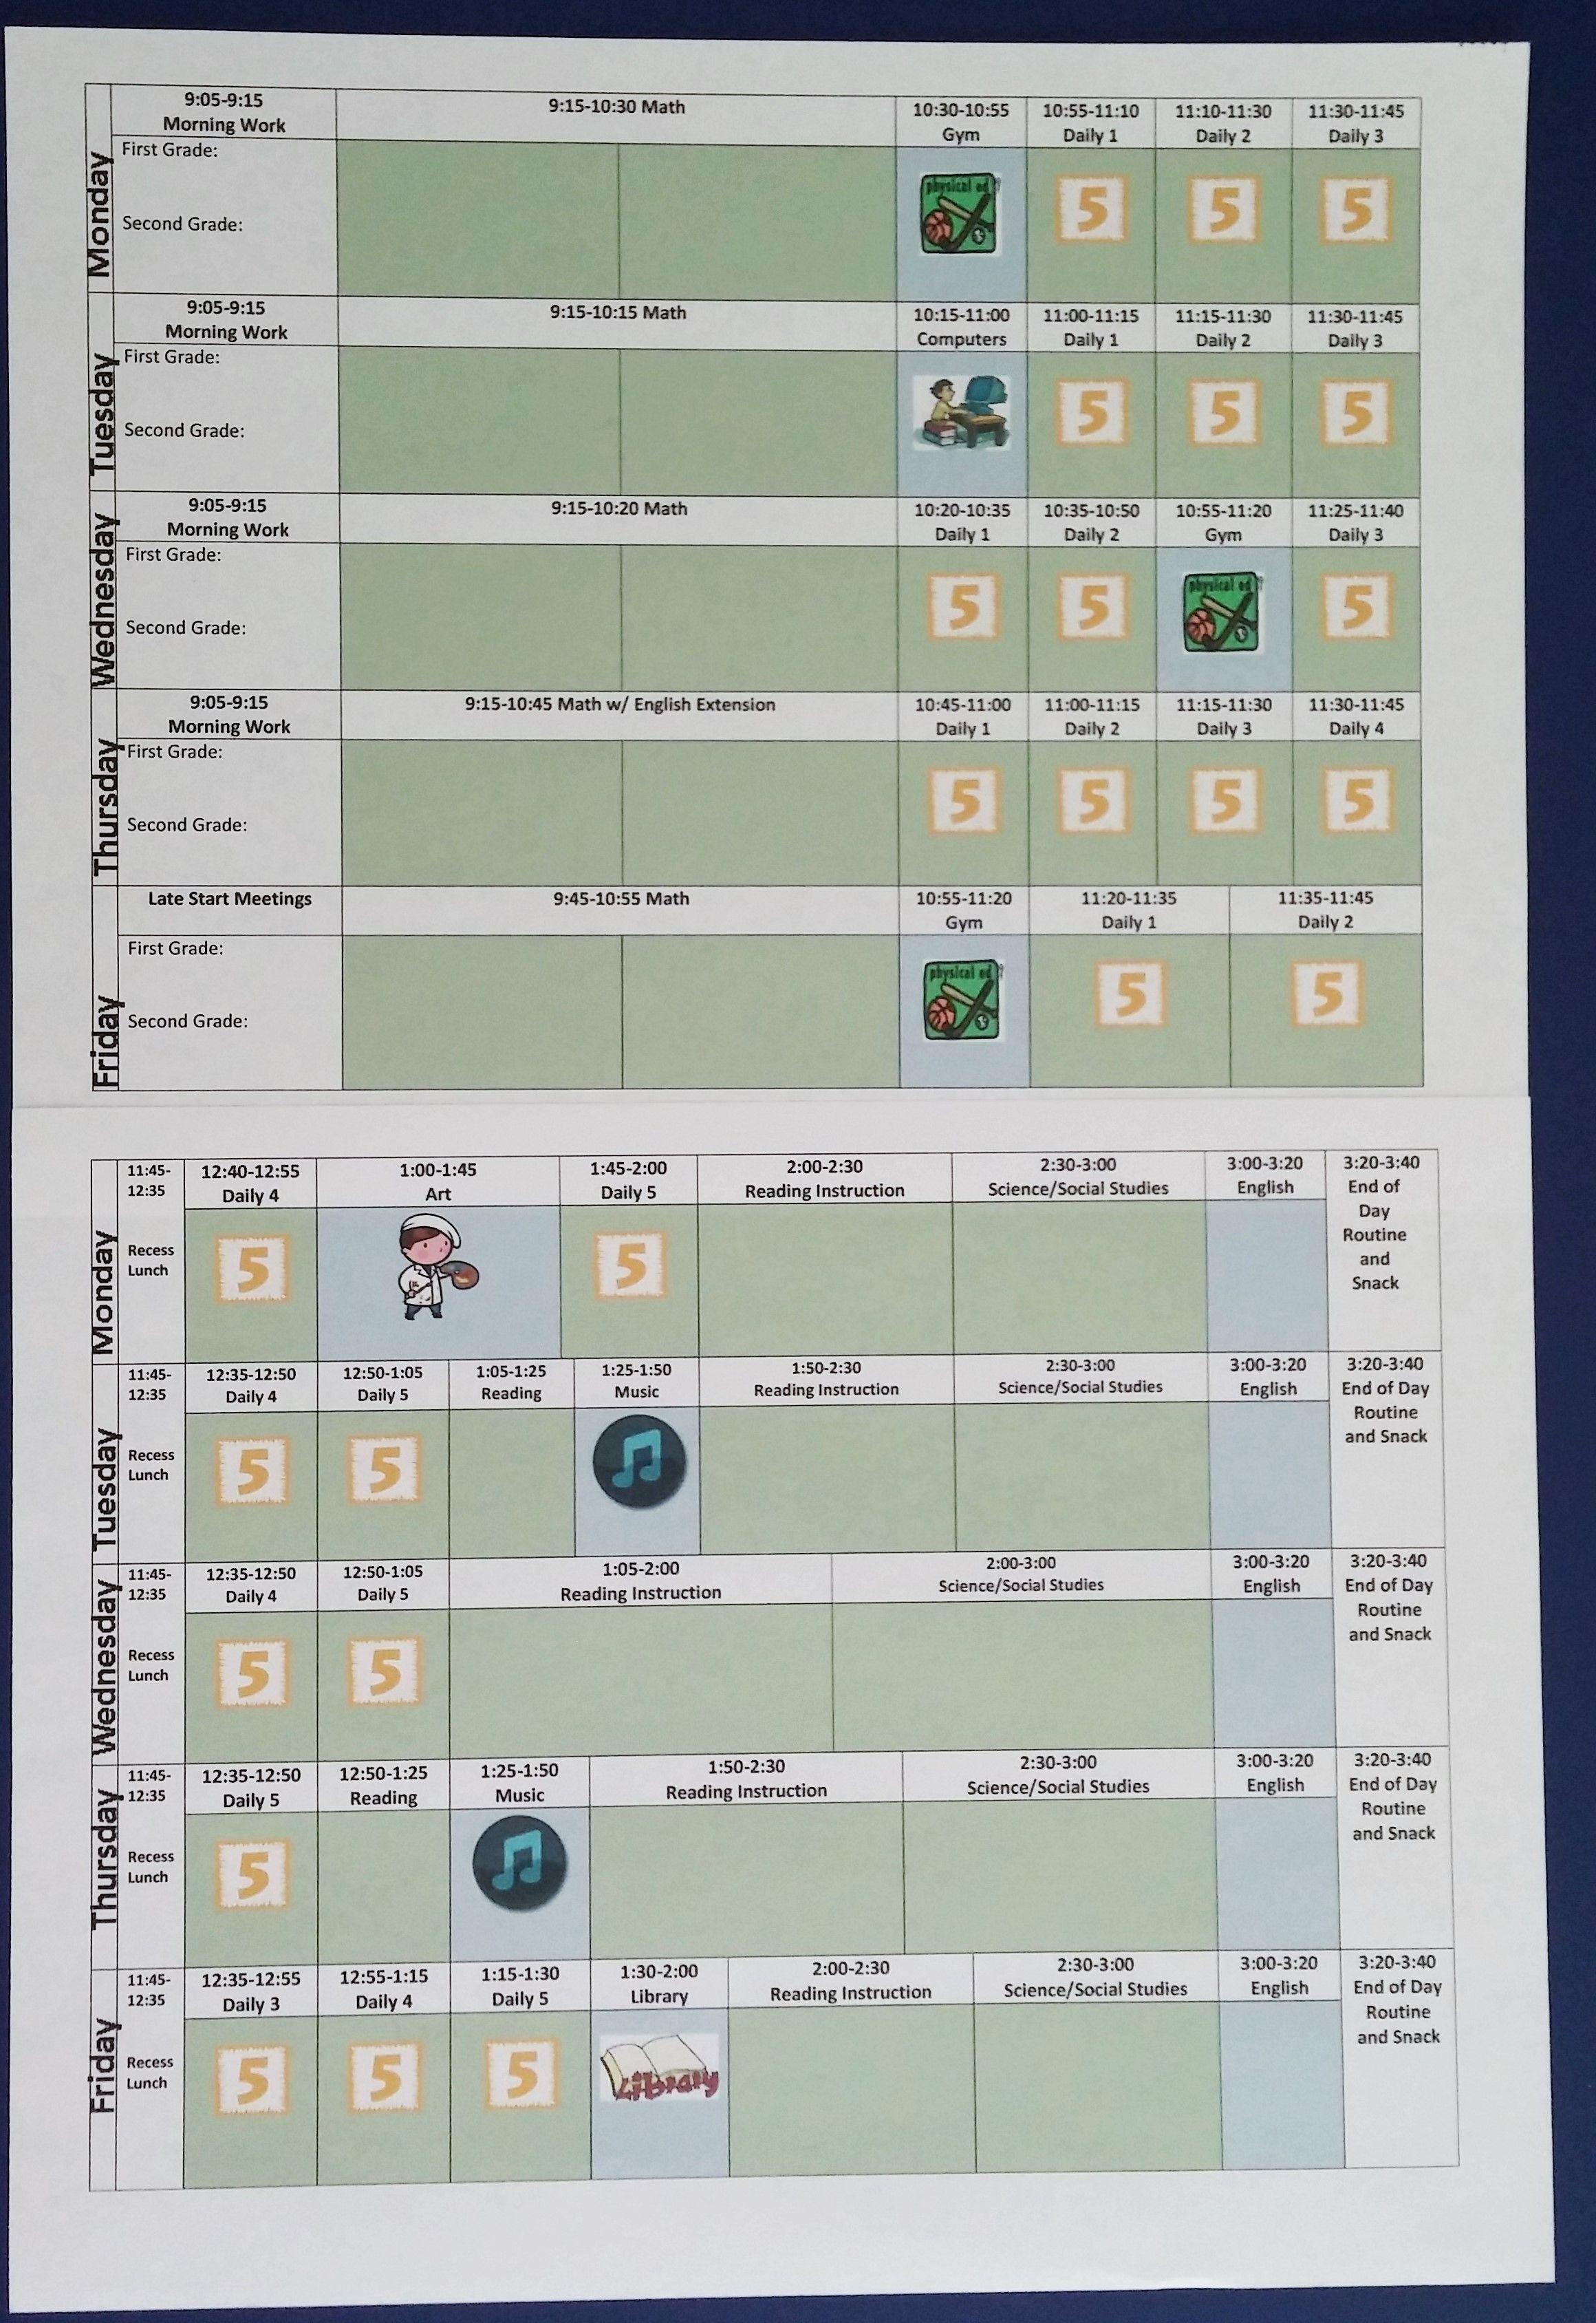 My Week At A Glance Schedule